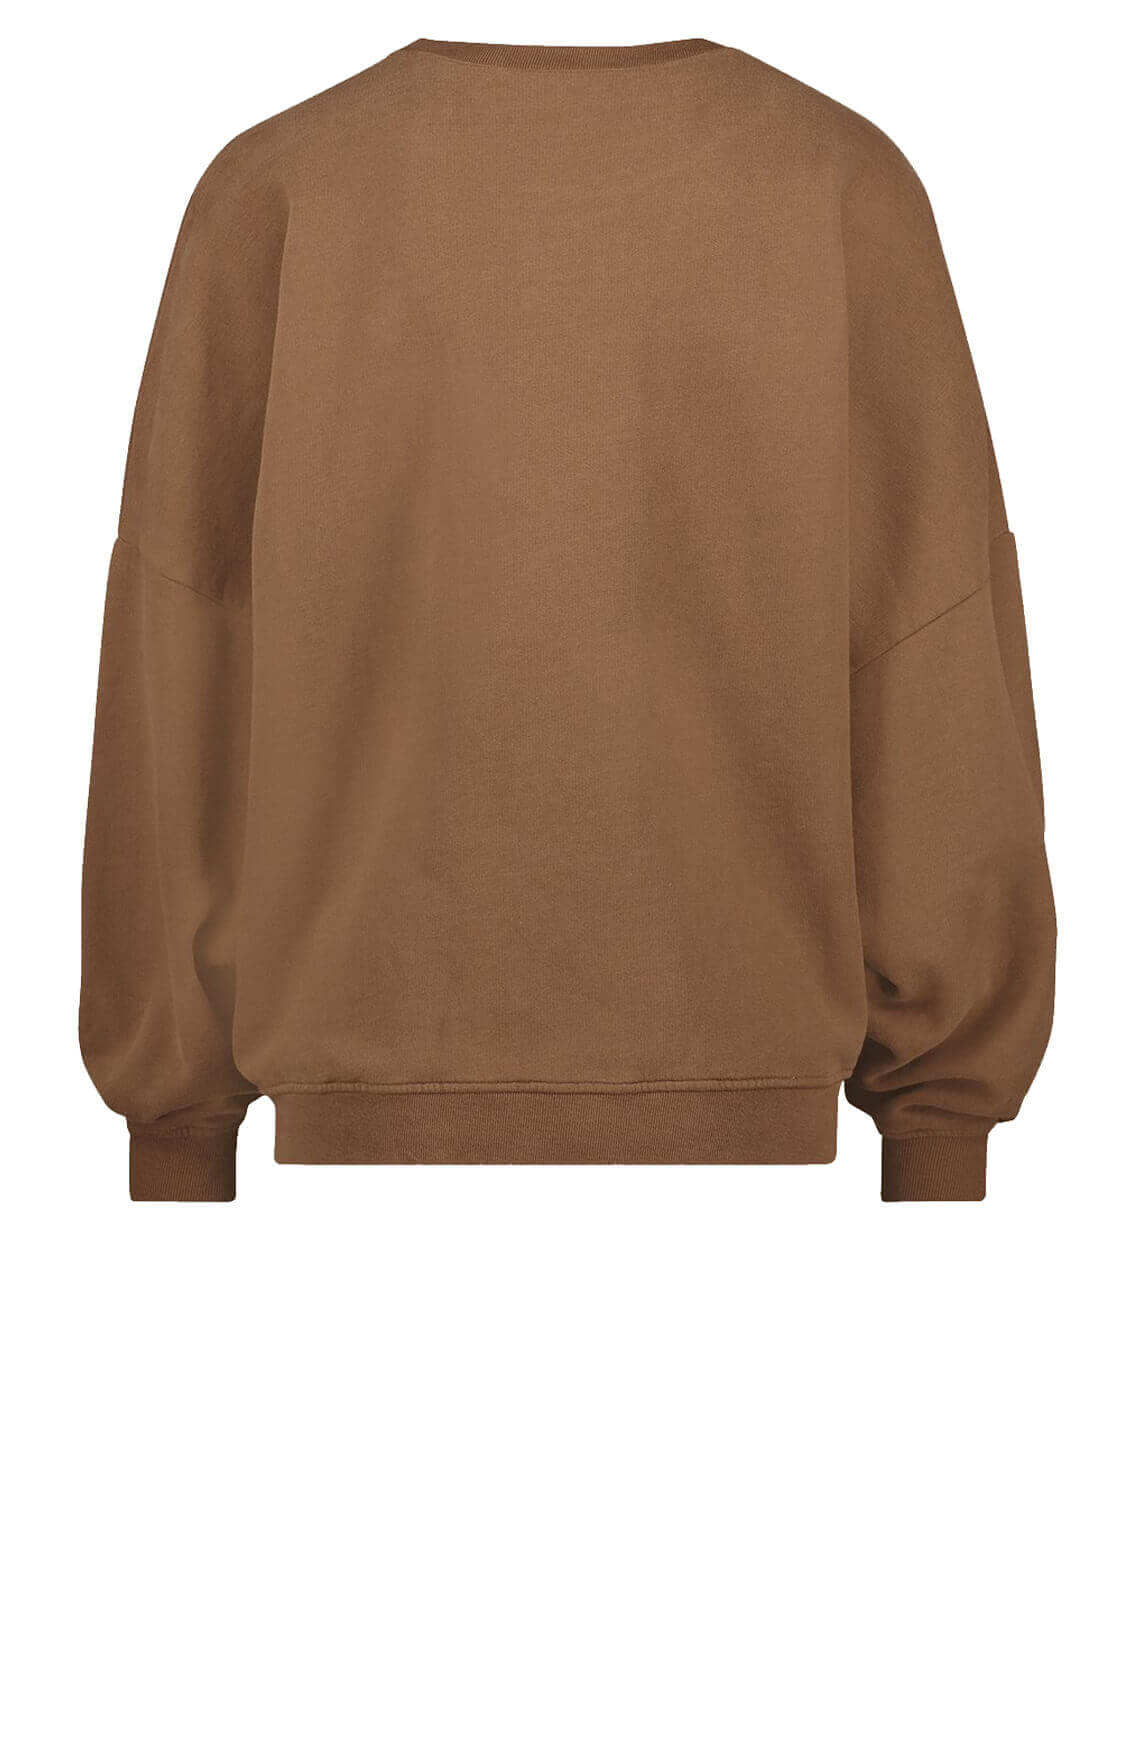 Penn & Ink Dames Sweater Bruin